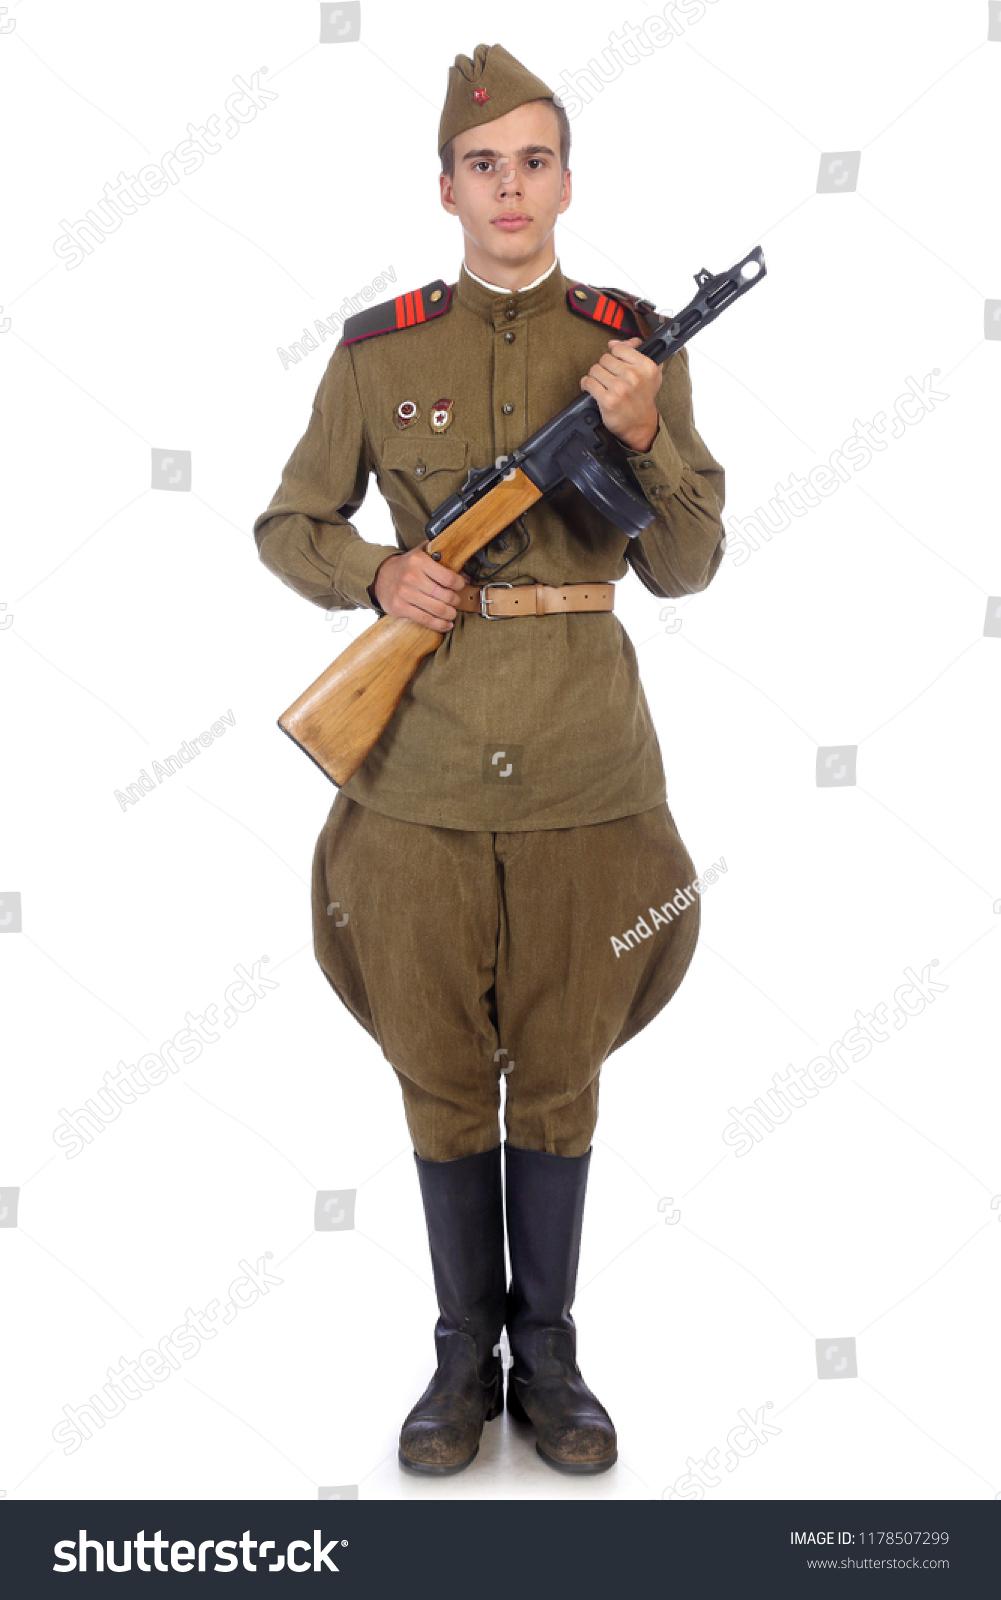 Картинки солдата по стойке смирно